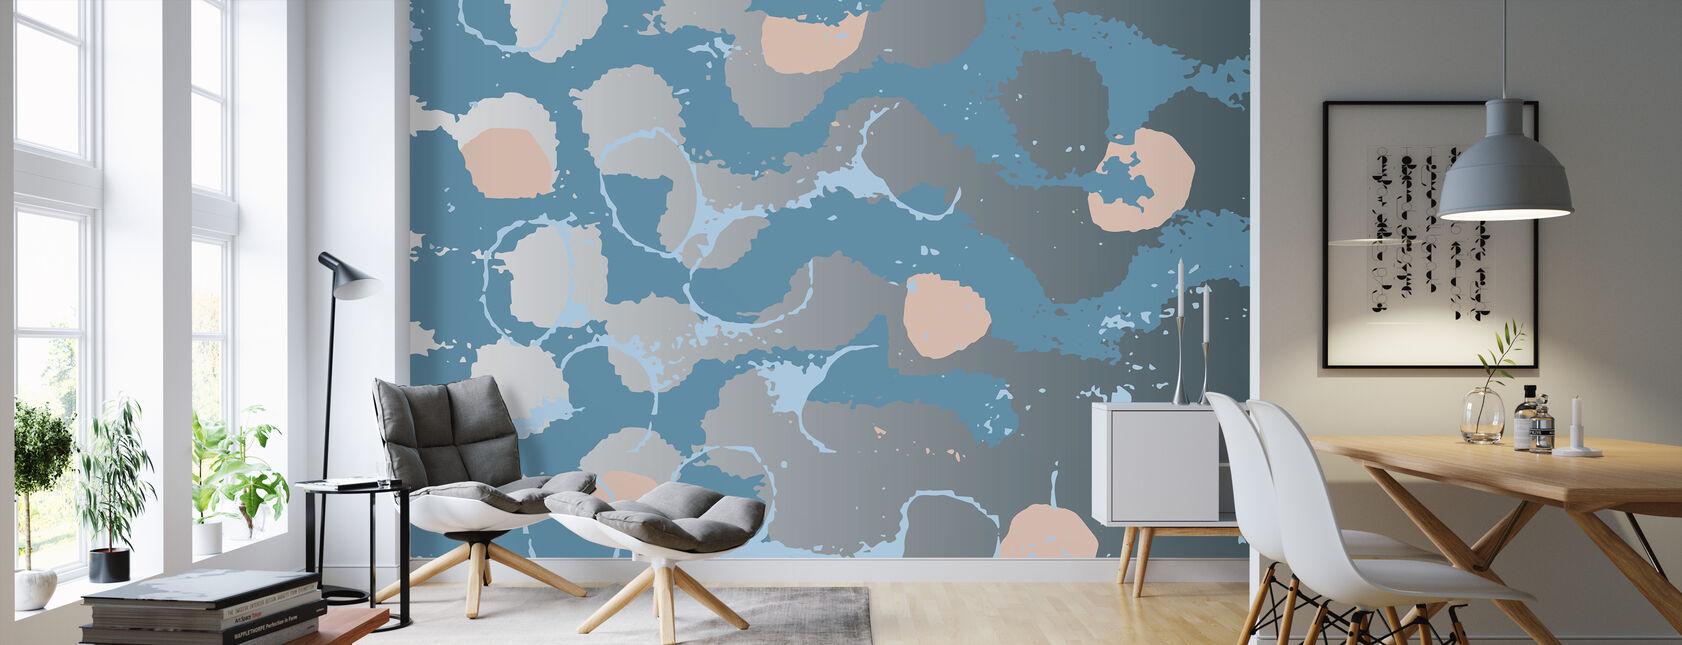 Blue Reflections - Wallpaper - Living Room